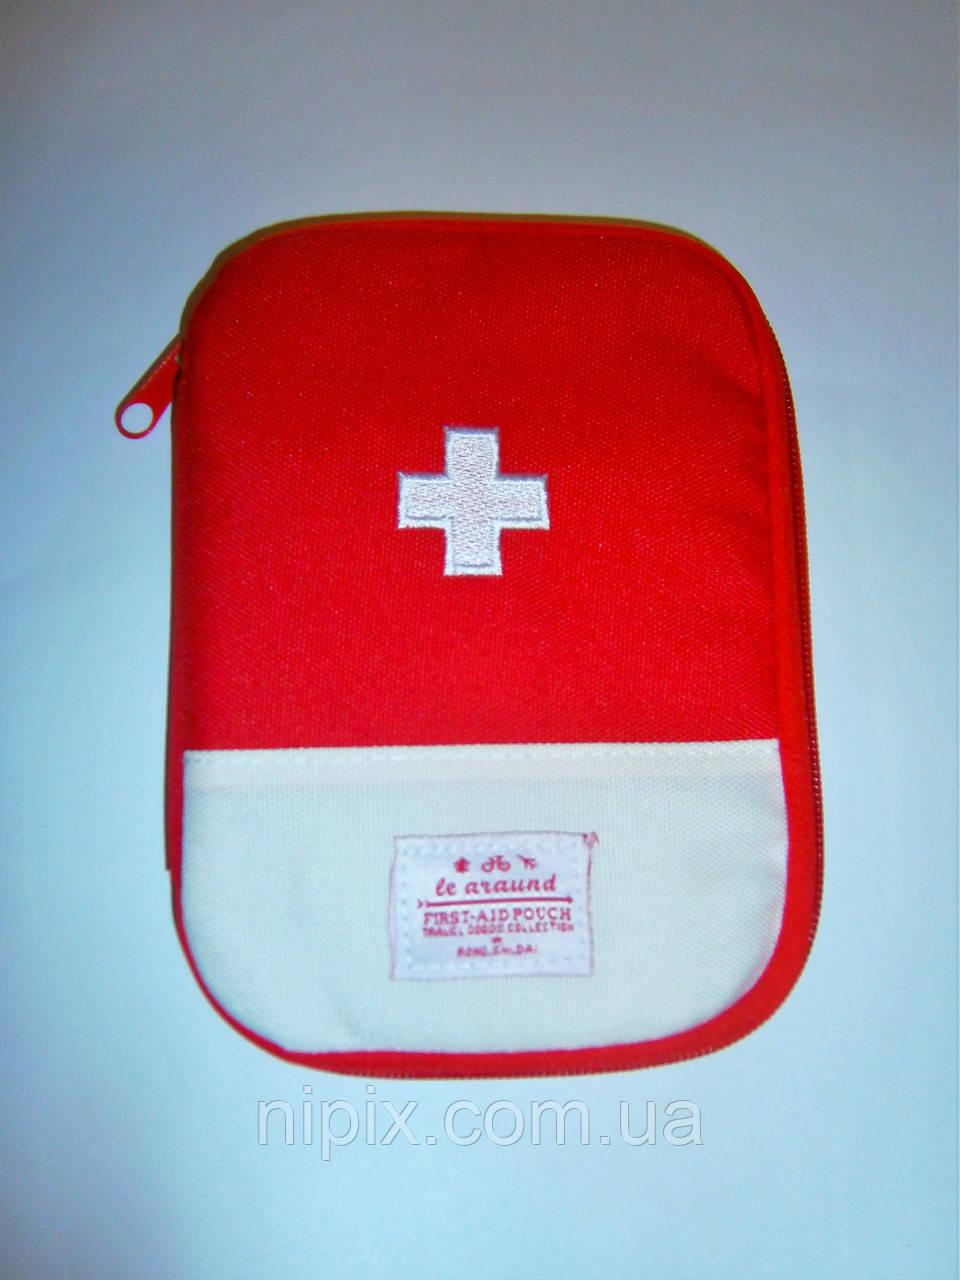 Аптечка-органайзер походная First-Aid Pouch